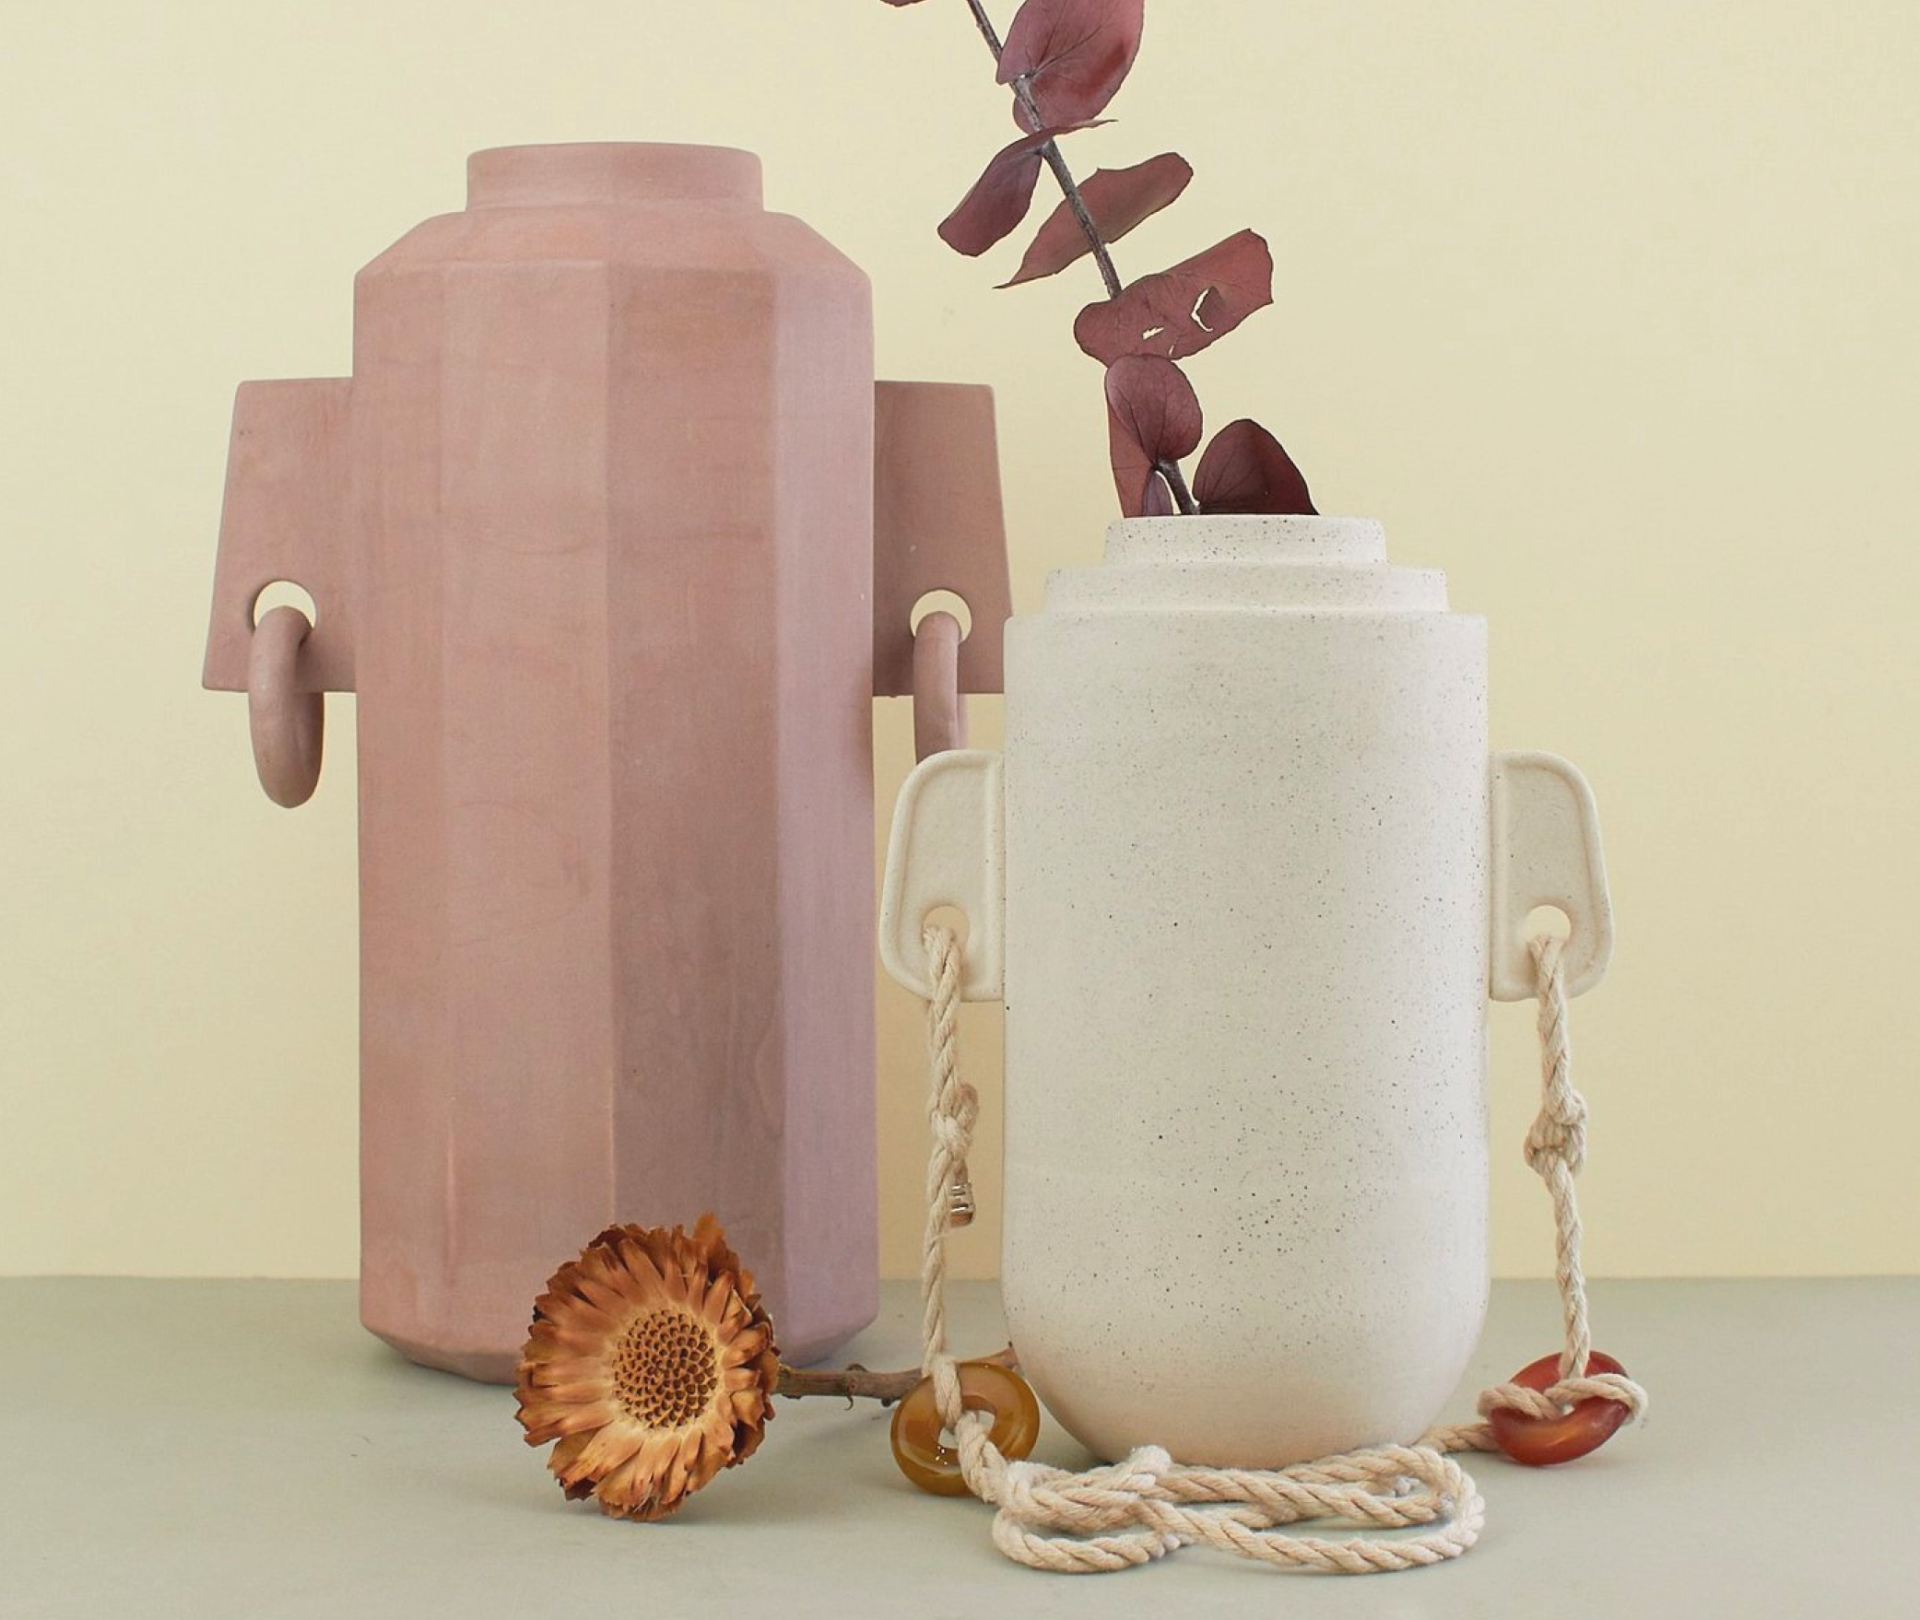 Vases sculpturaux